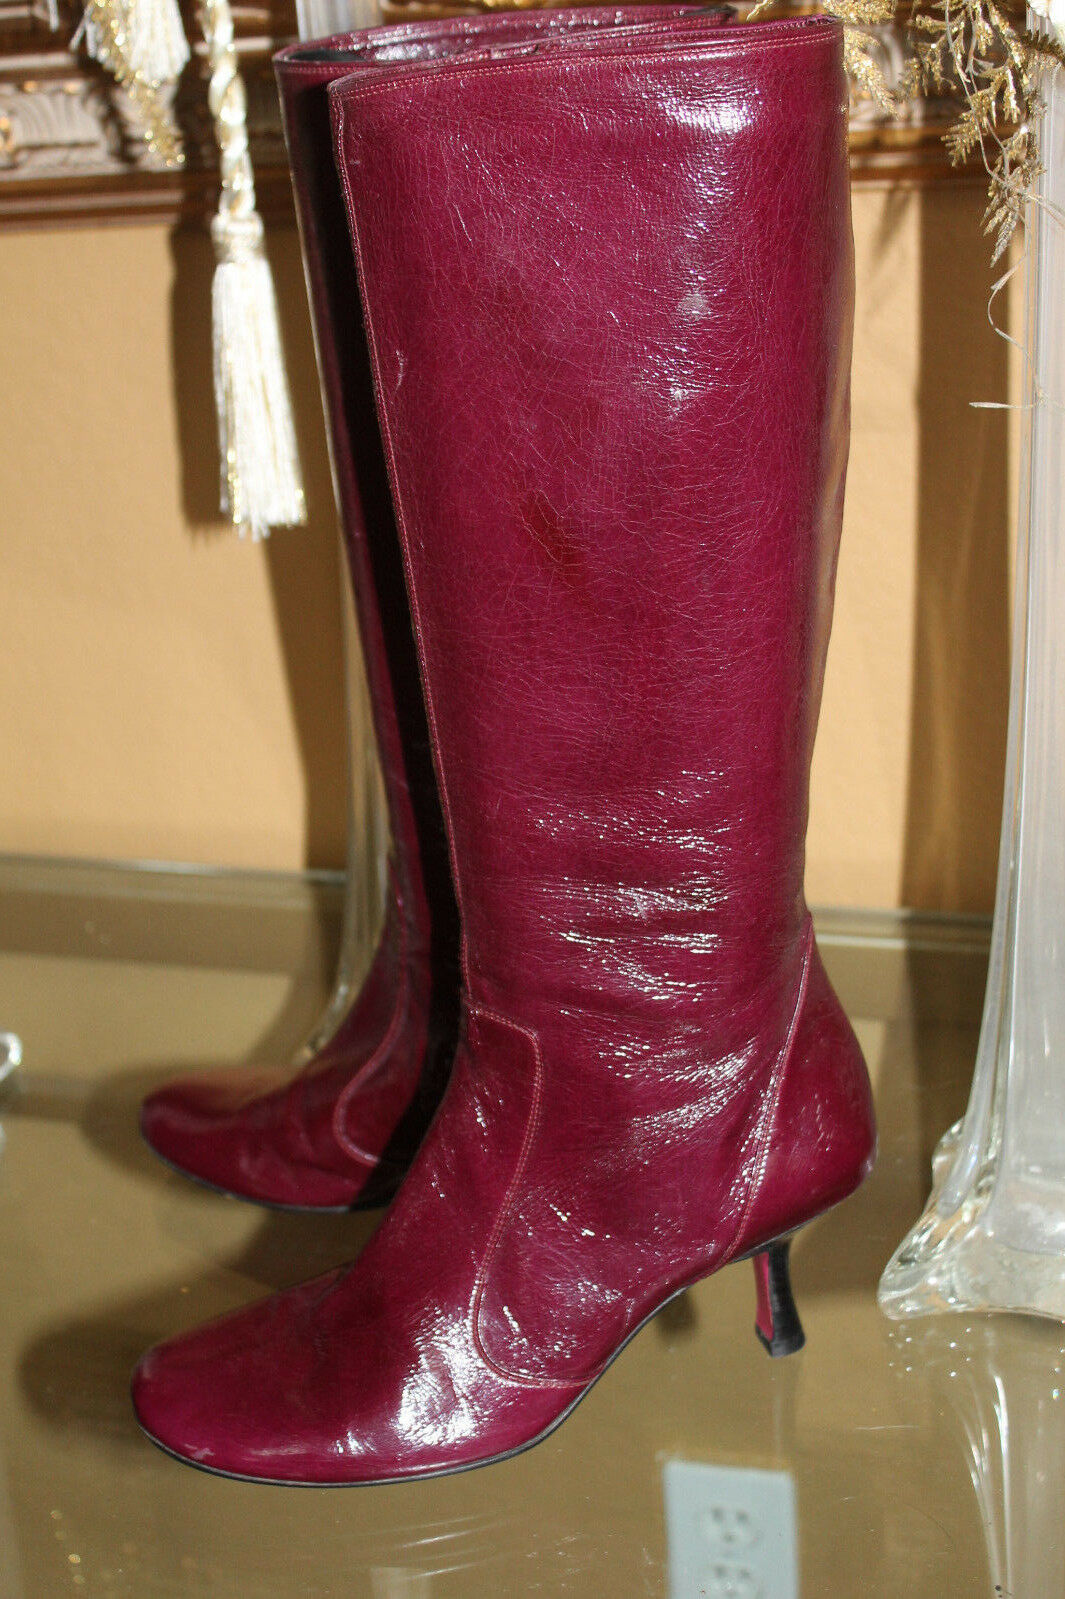 EMANUEL UNGARO Stiefel PURPLE/PINK  Patent Leder 7  Heels Schuhes TALL SOLID